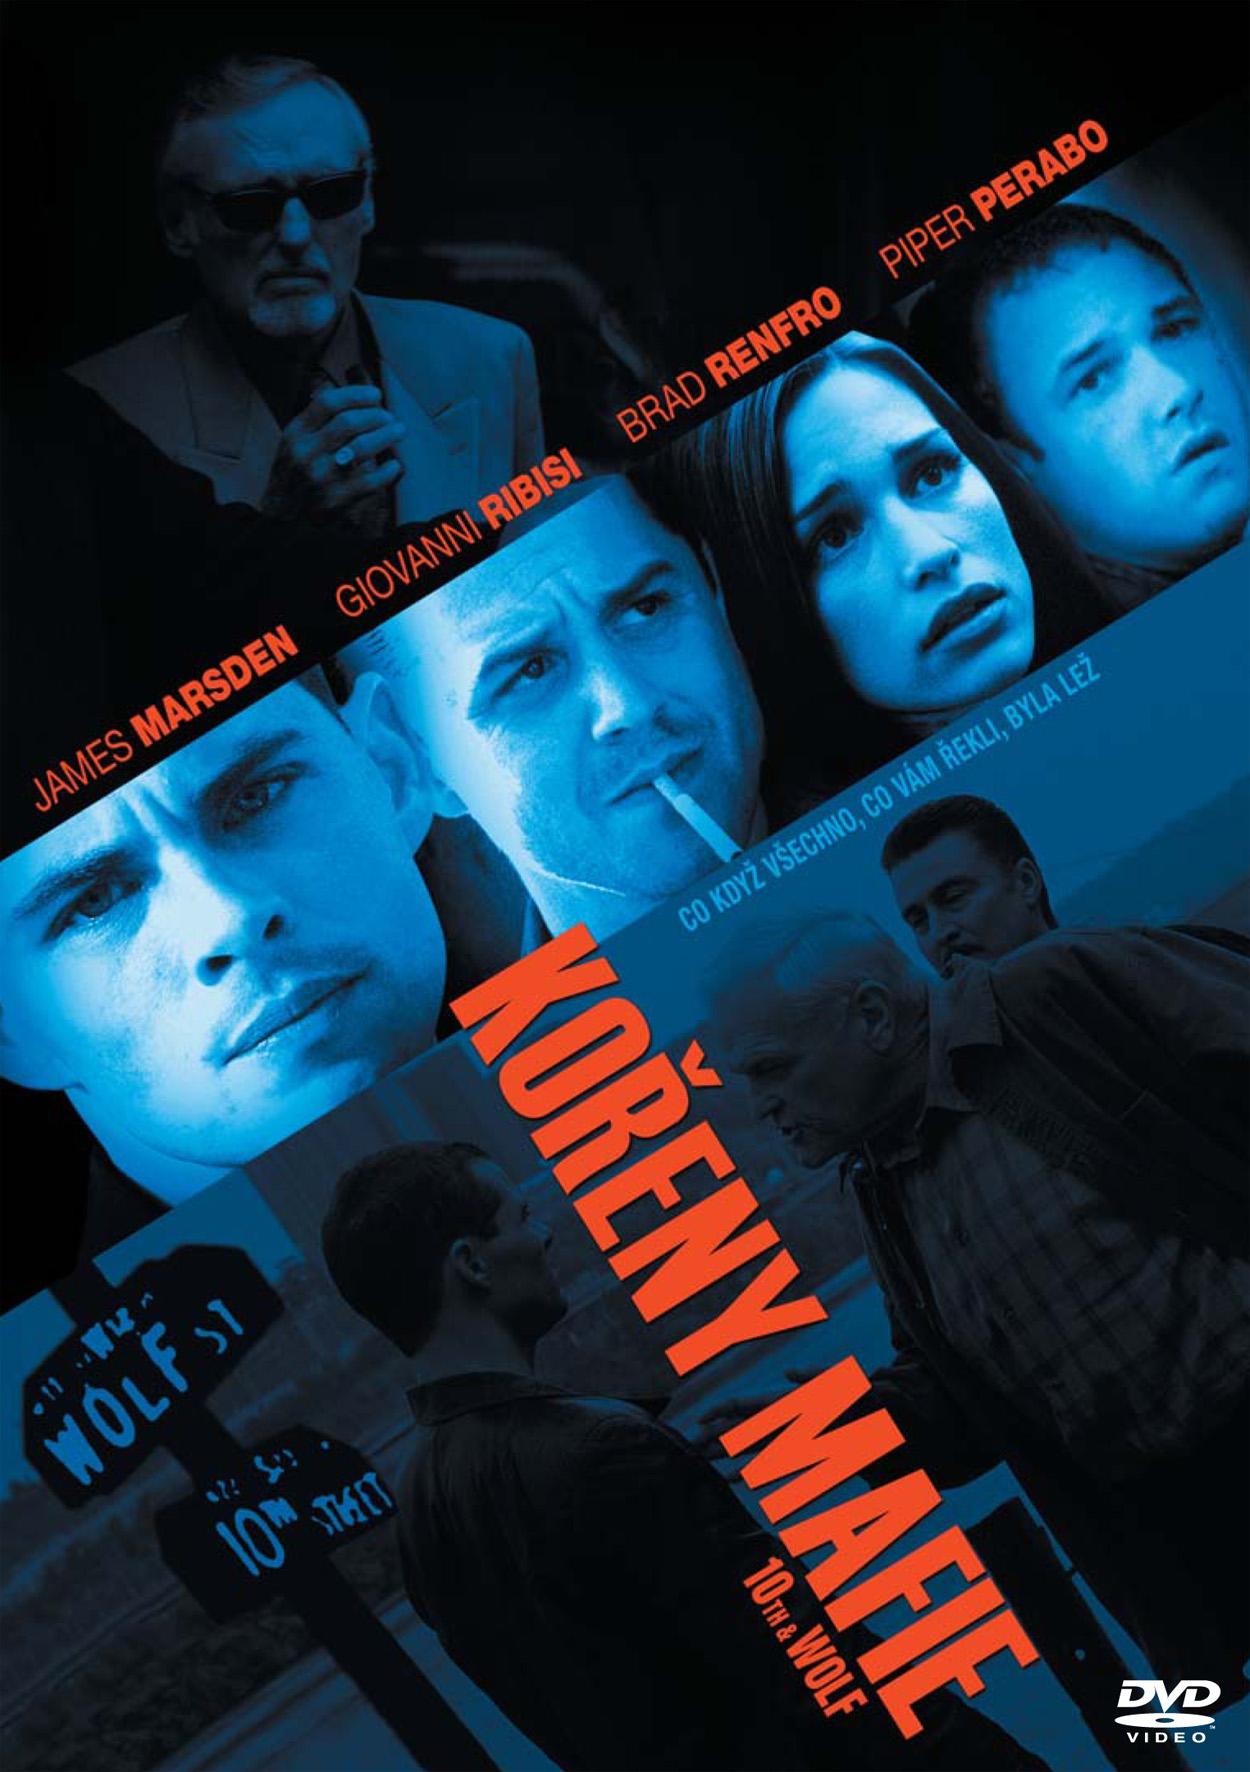 Spustit online film zdarma Kořeny mafie